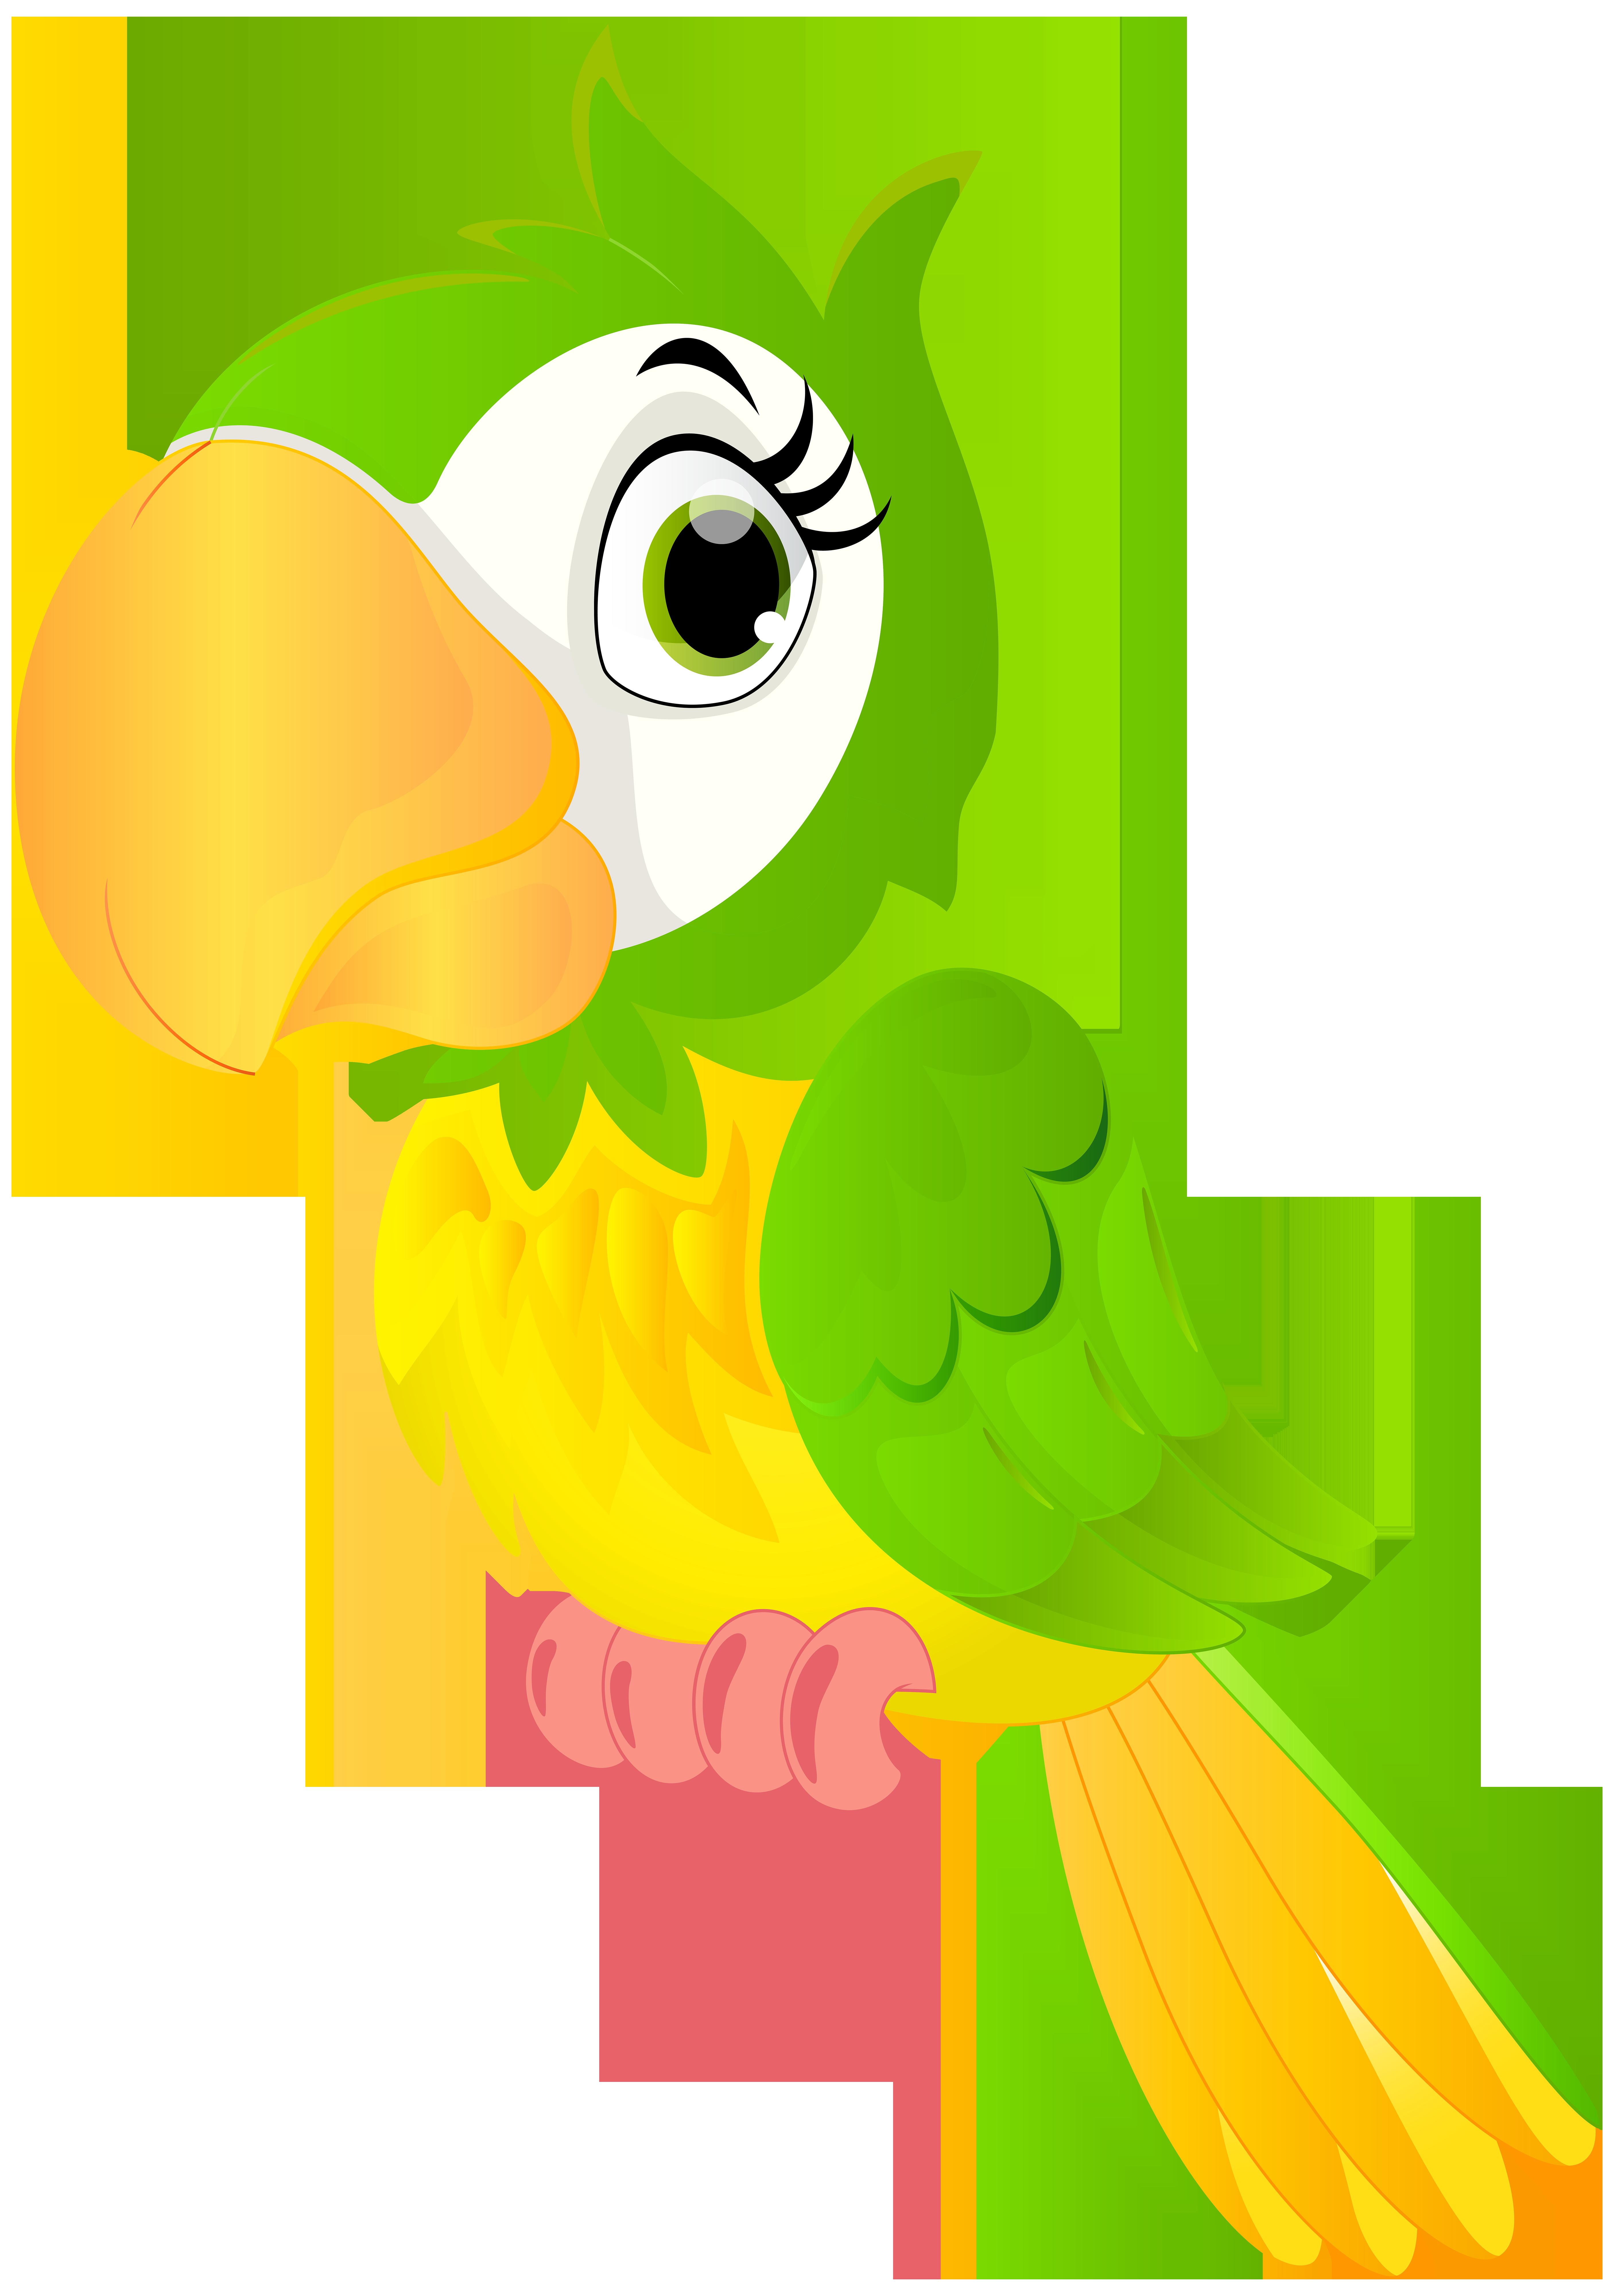 Parrot Cartoon PNG Clip Art Image.